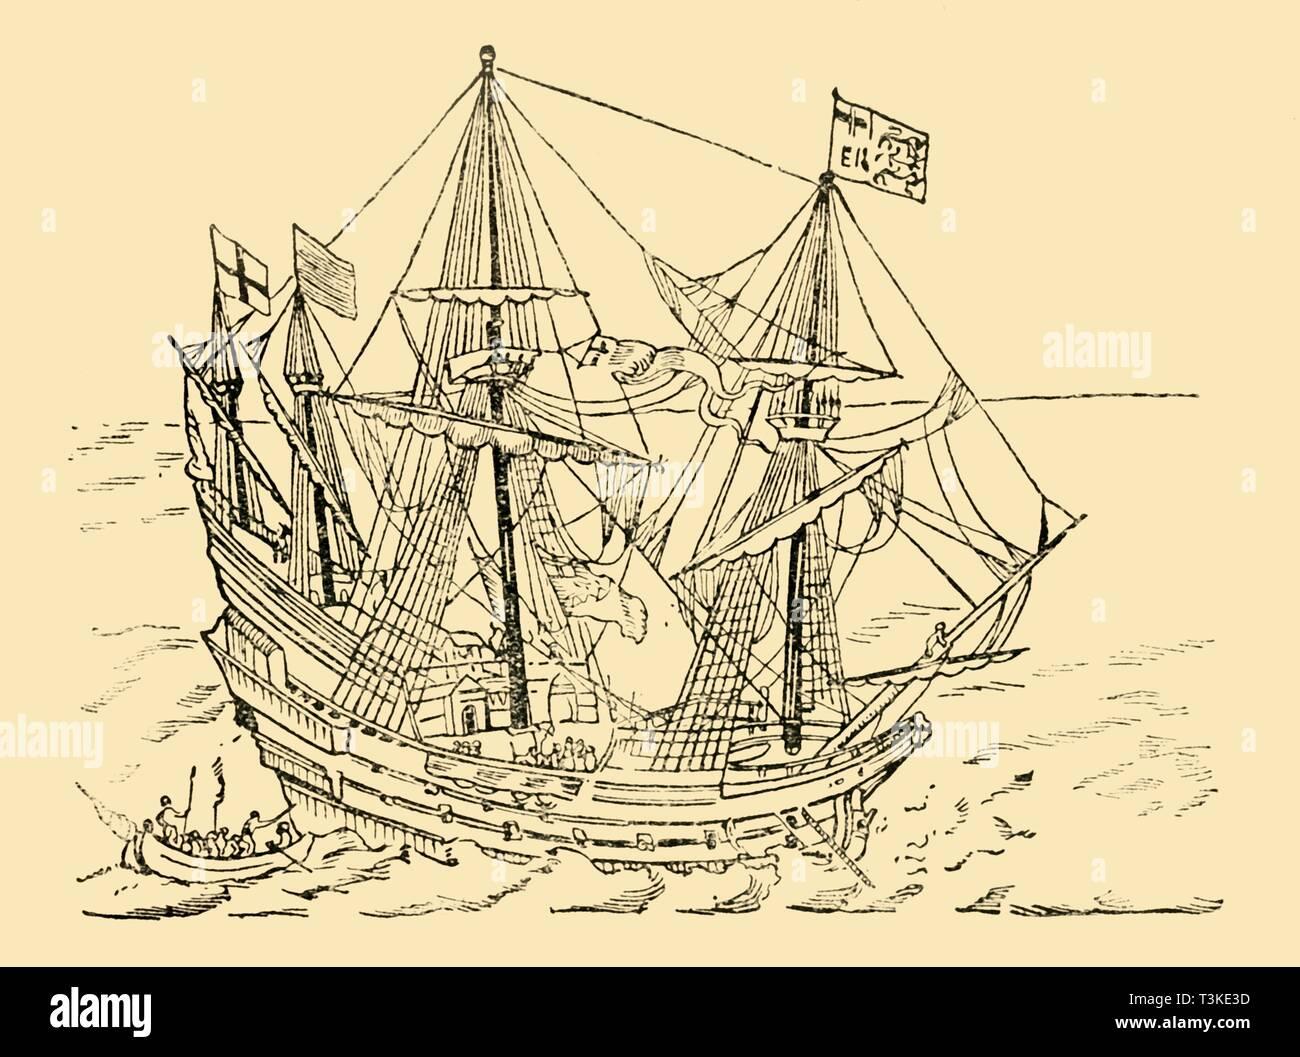 'An English Ship in the Armada Fight', c1930. Creator: Unknown. - Stock Image